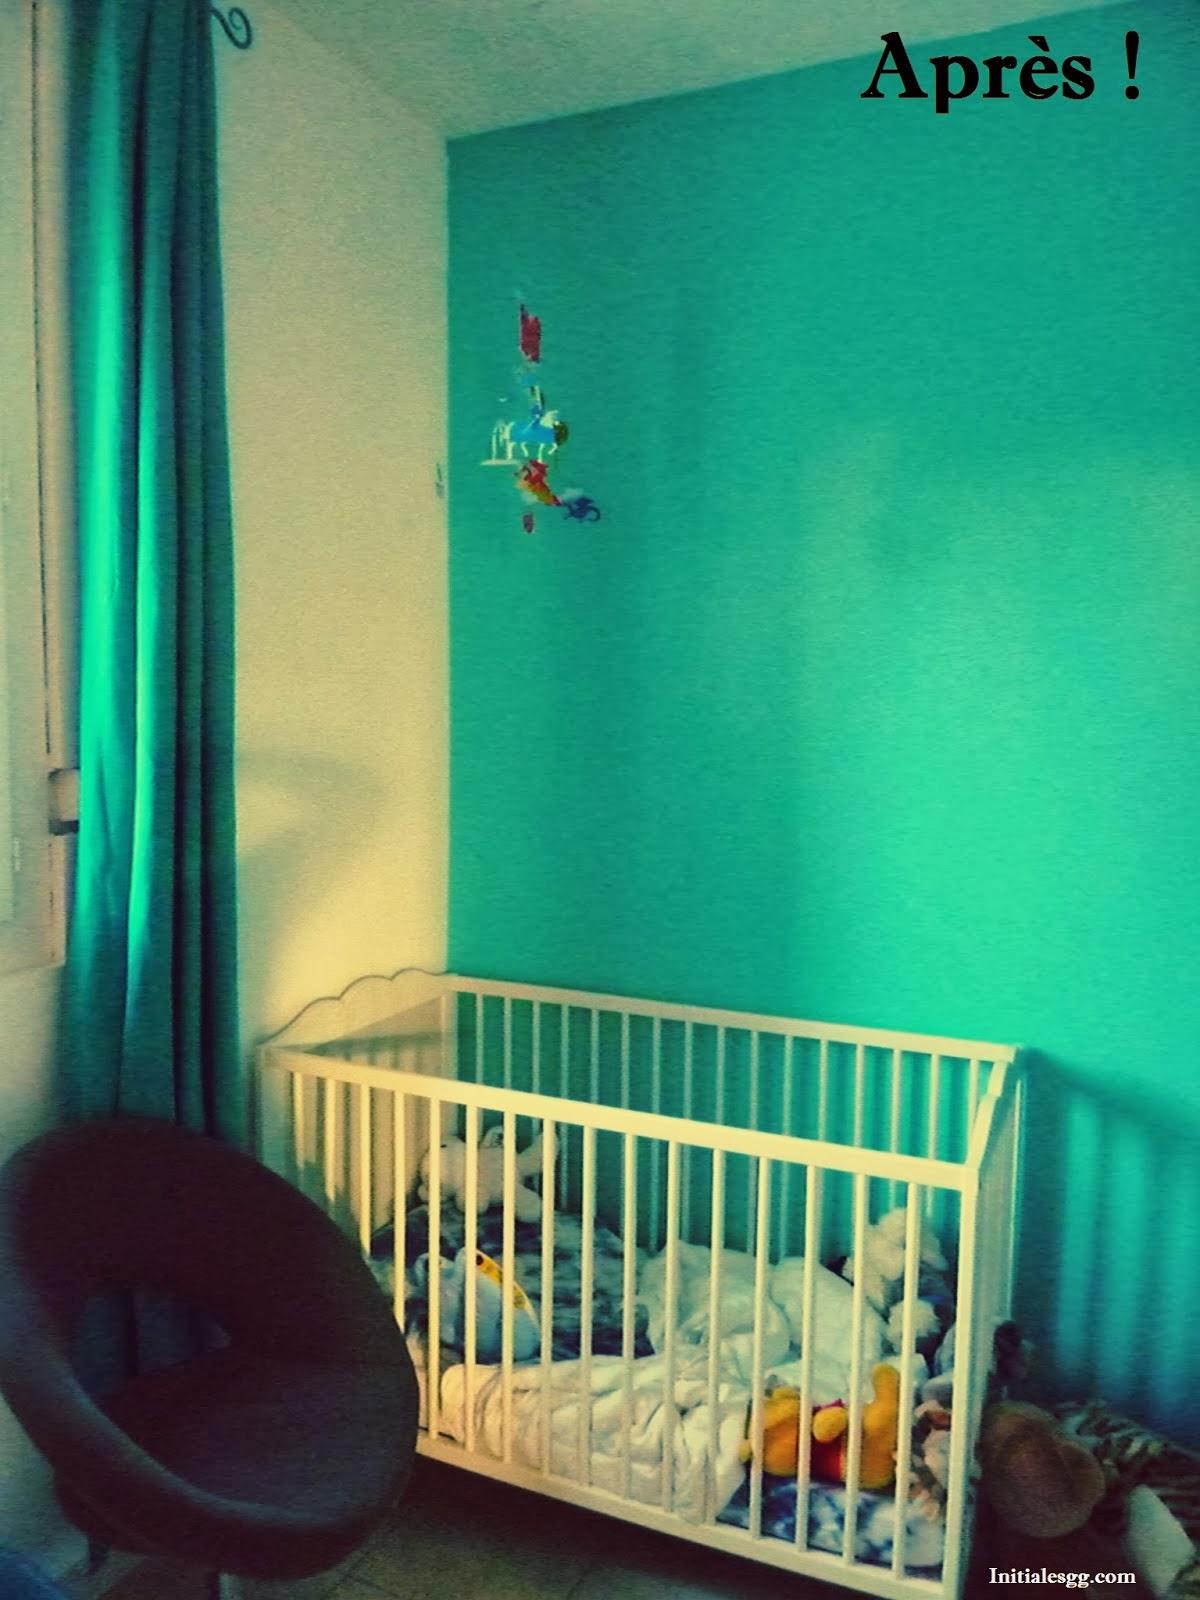 test la peinture monocouche colours de castorama initiales gg. Black Bedroom Furniture Sets. Home Design Ideas